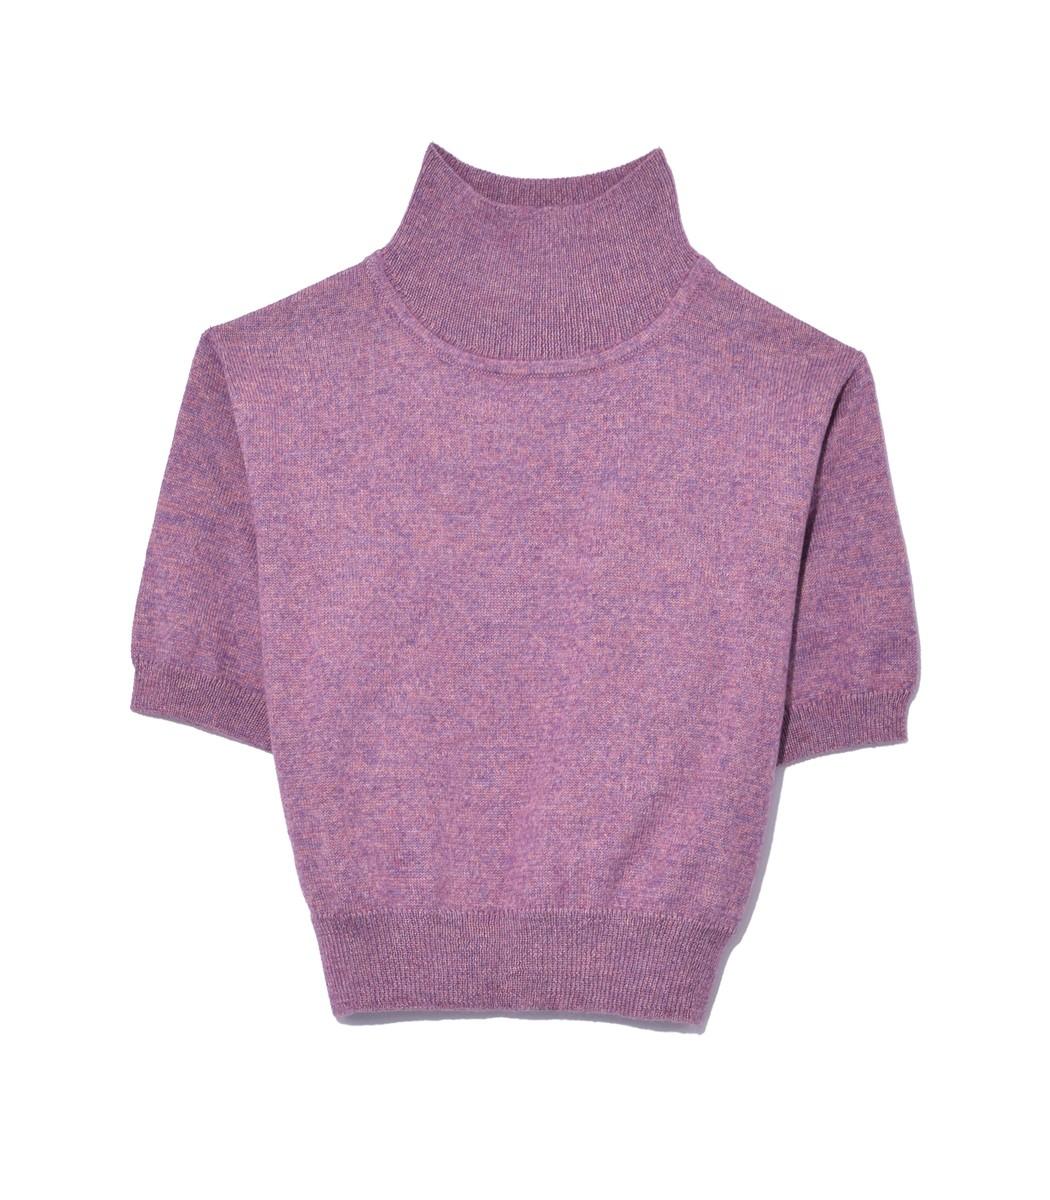 Rachel Comey Purple Lilac Cropped Tee